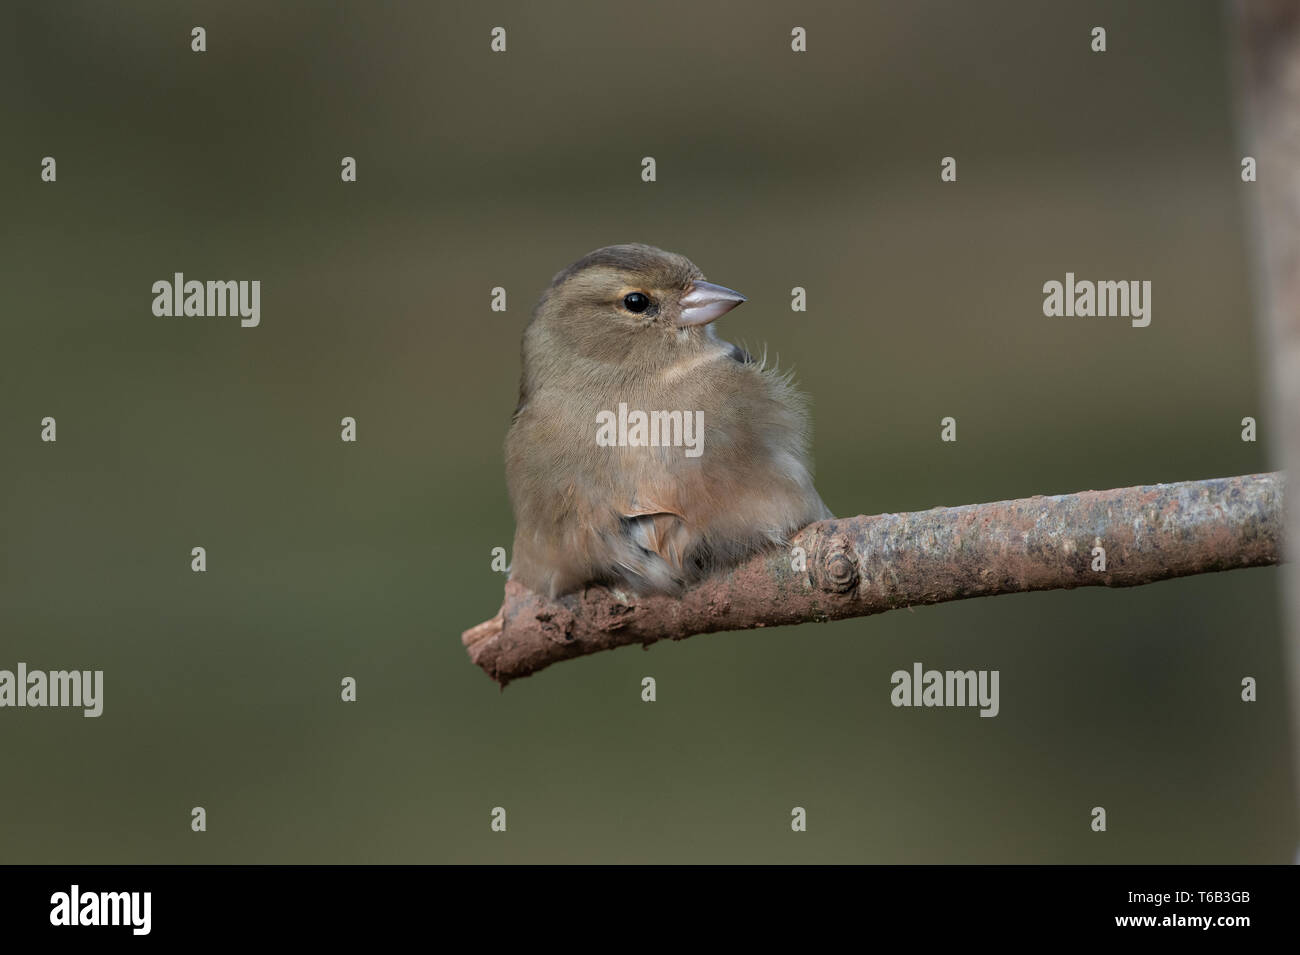 Female Chaffinch Stock Photo